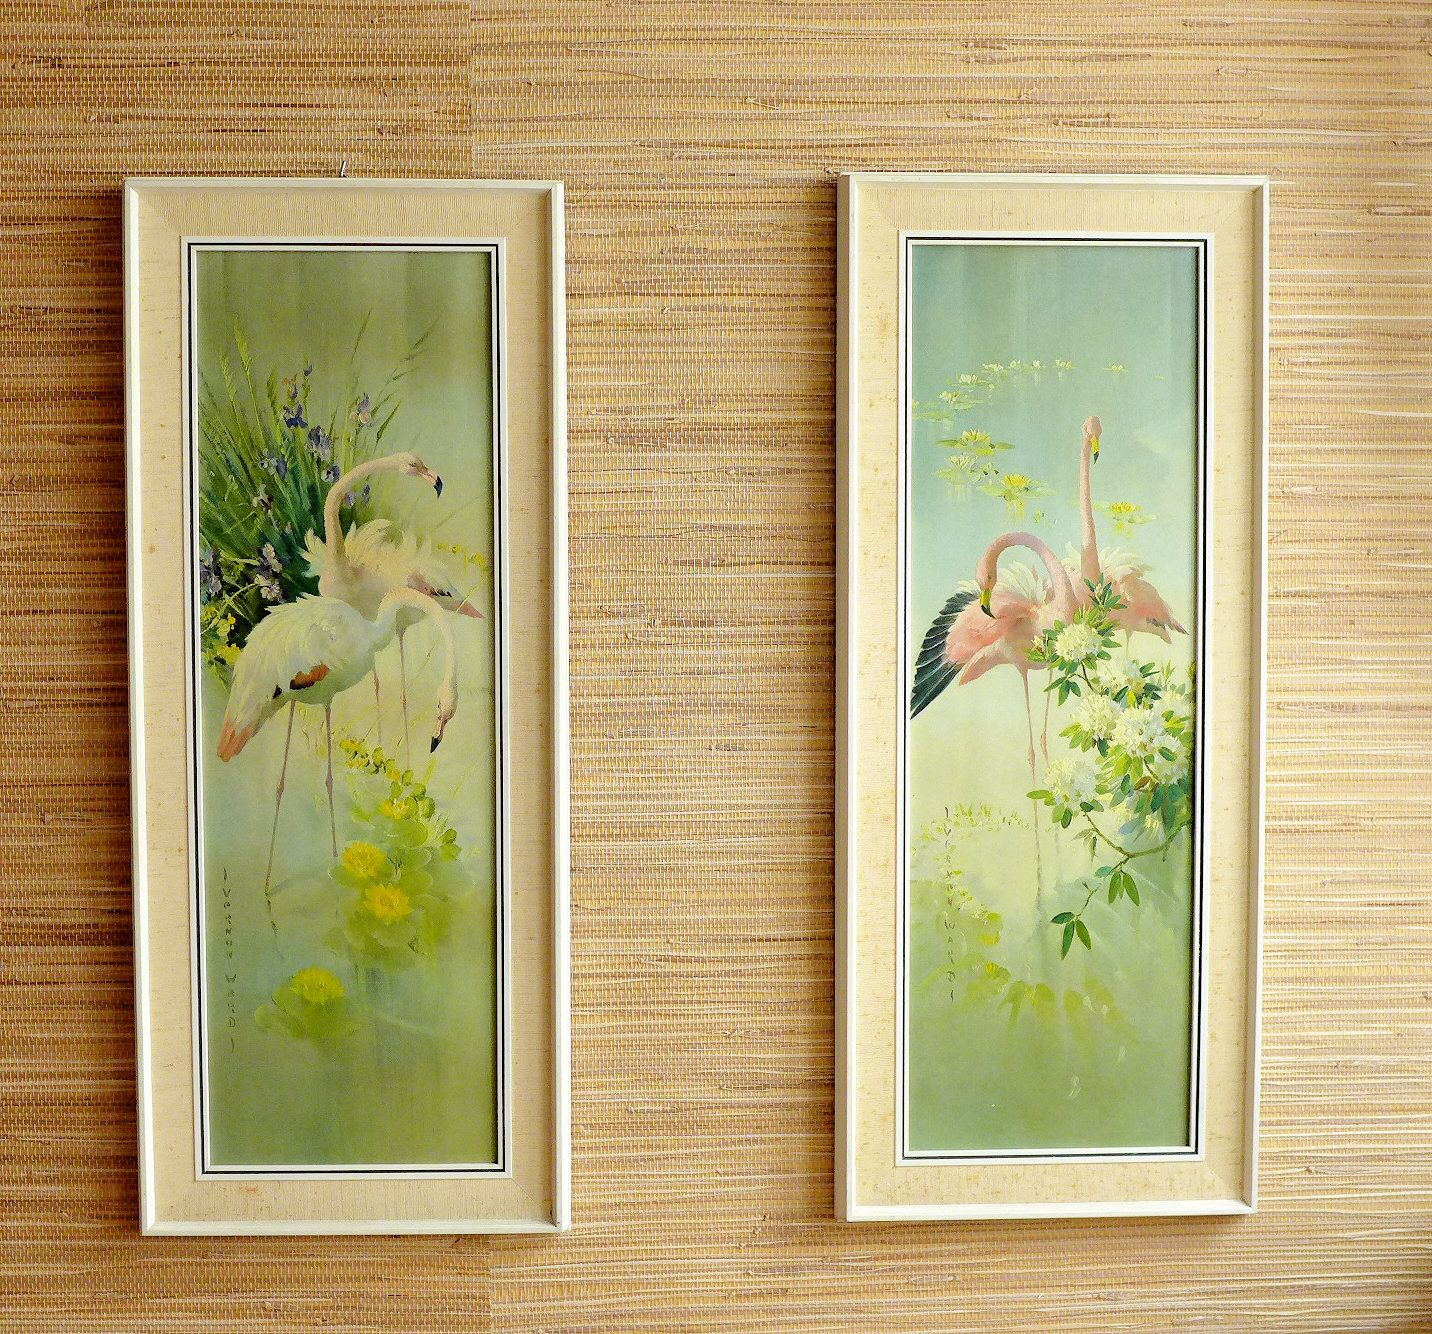 Flamingo Picture Wooden Frame Wall Art - Teak Brass - Wall Hanging ...